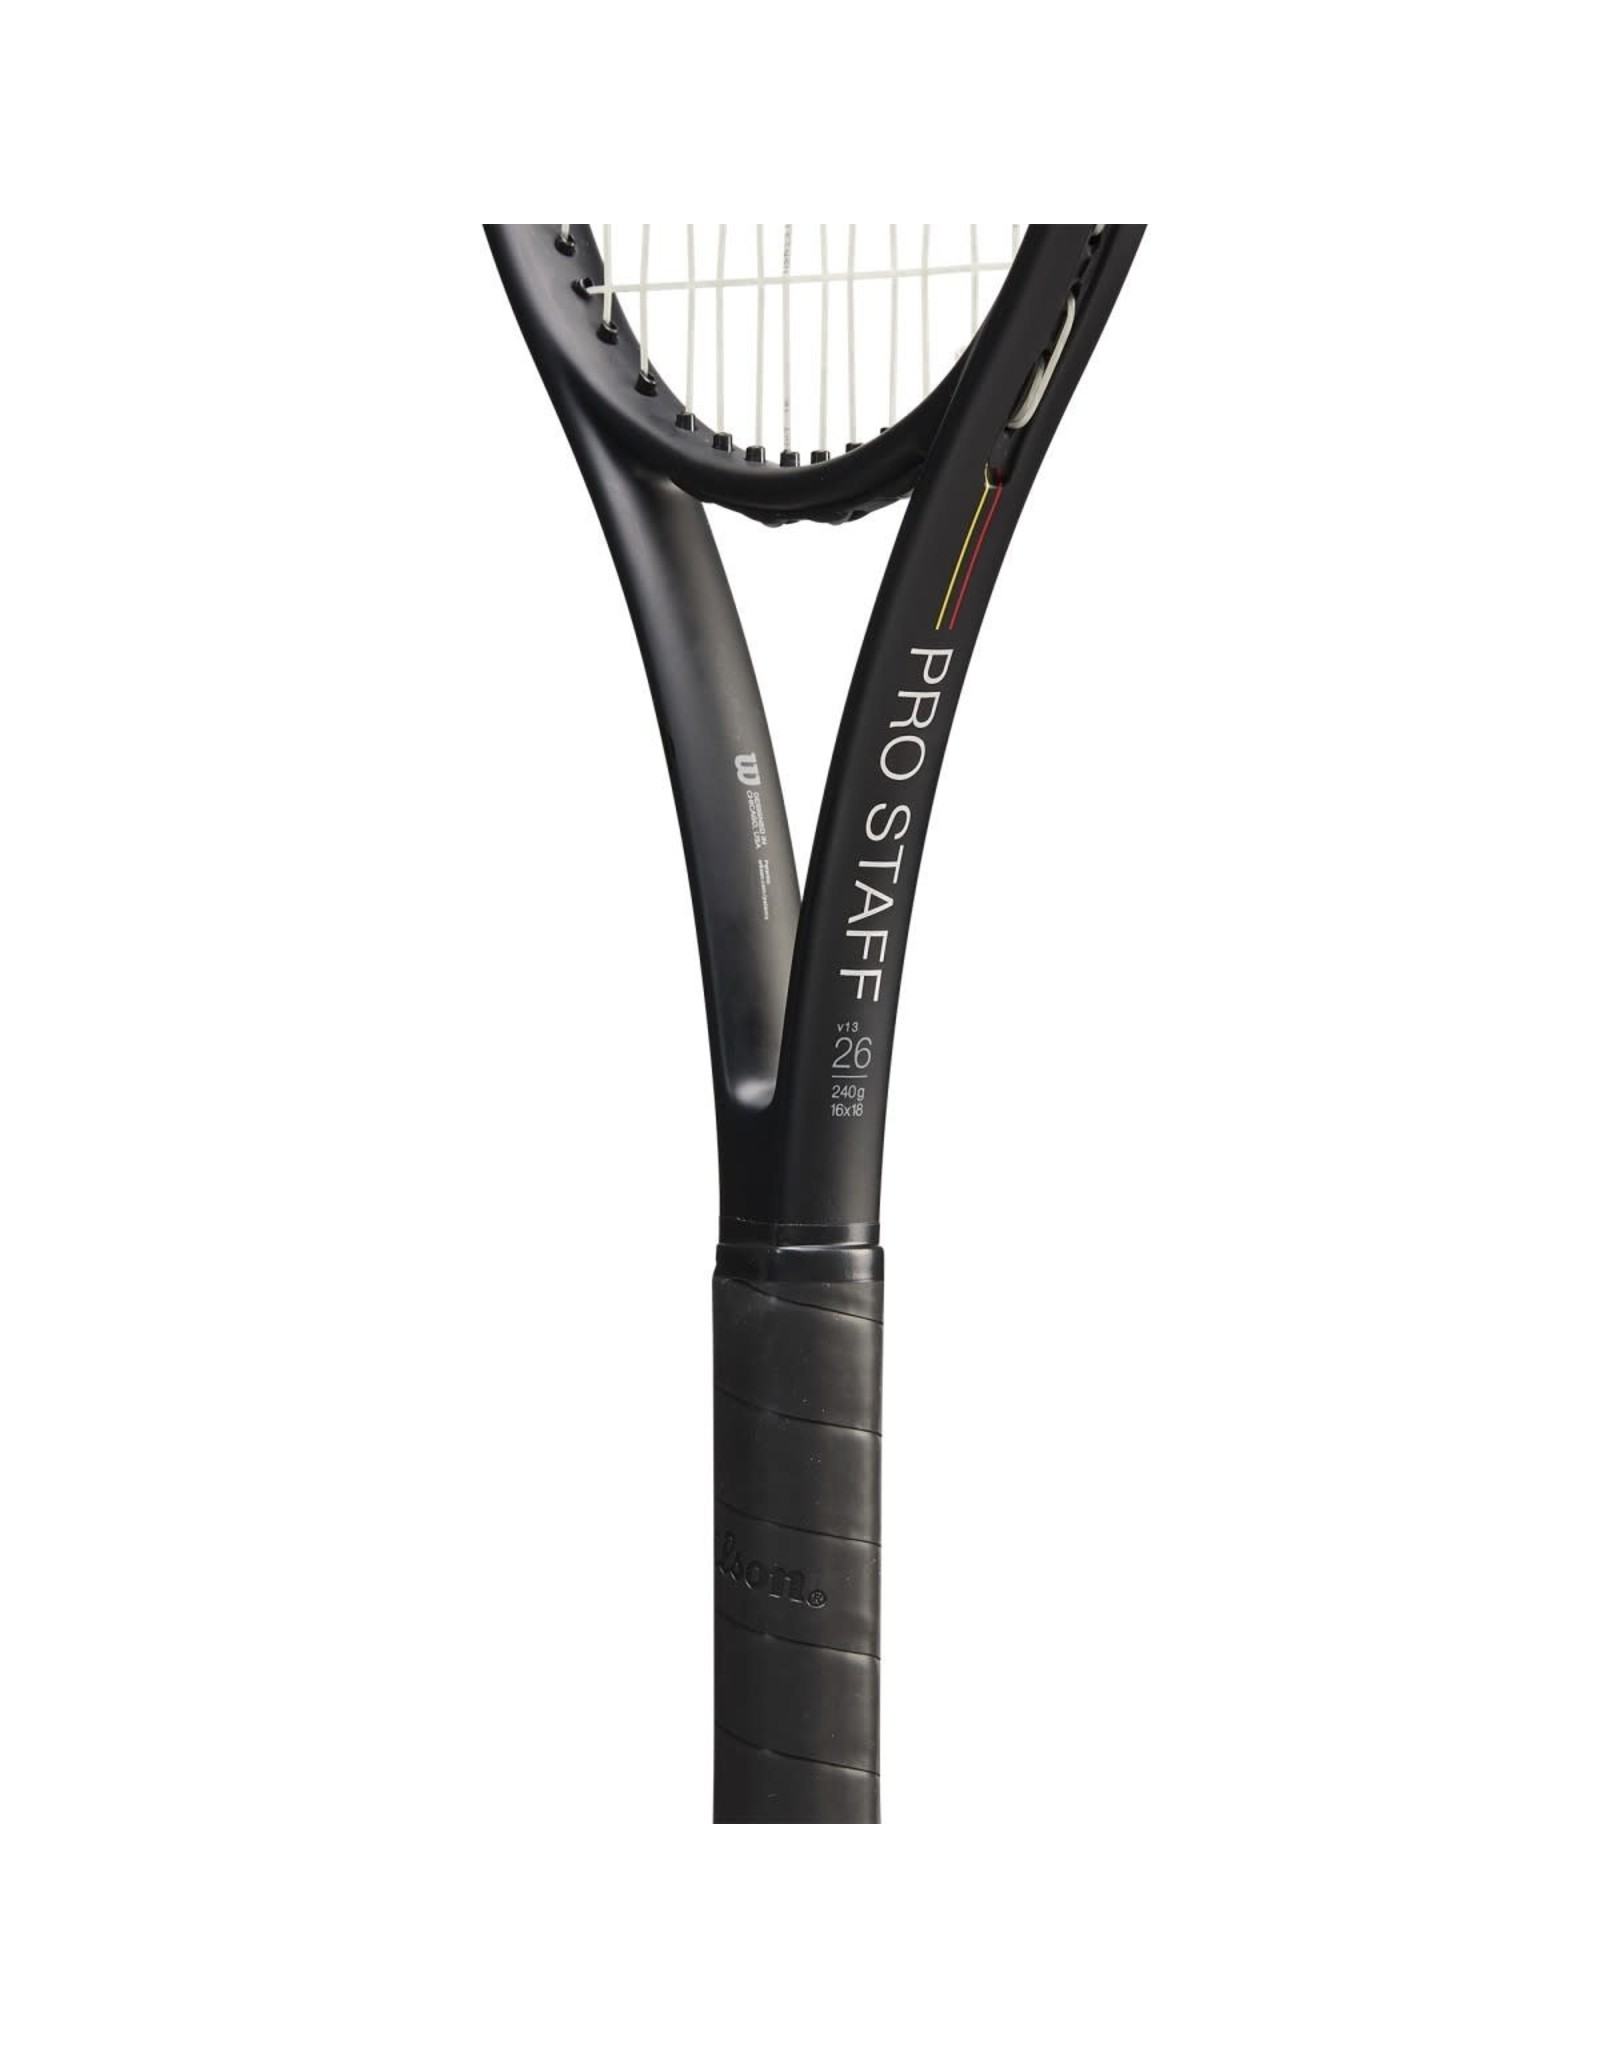 Wilson Wilson Pro Staff 26 Tennis Racket